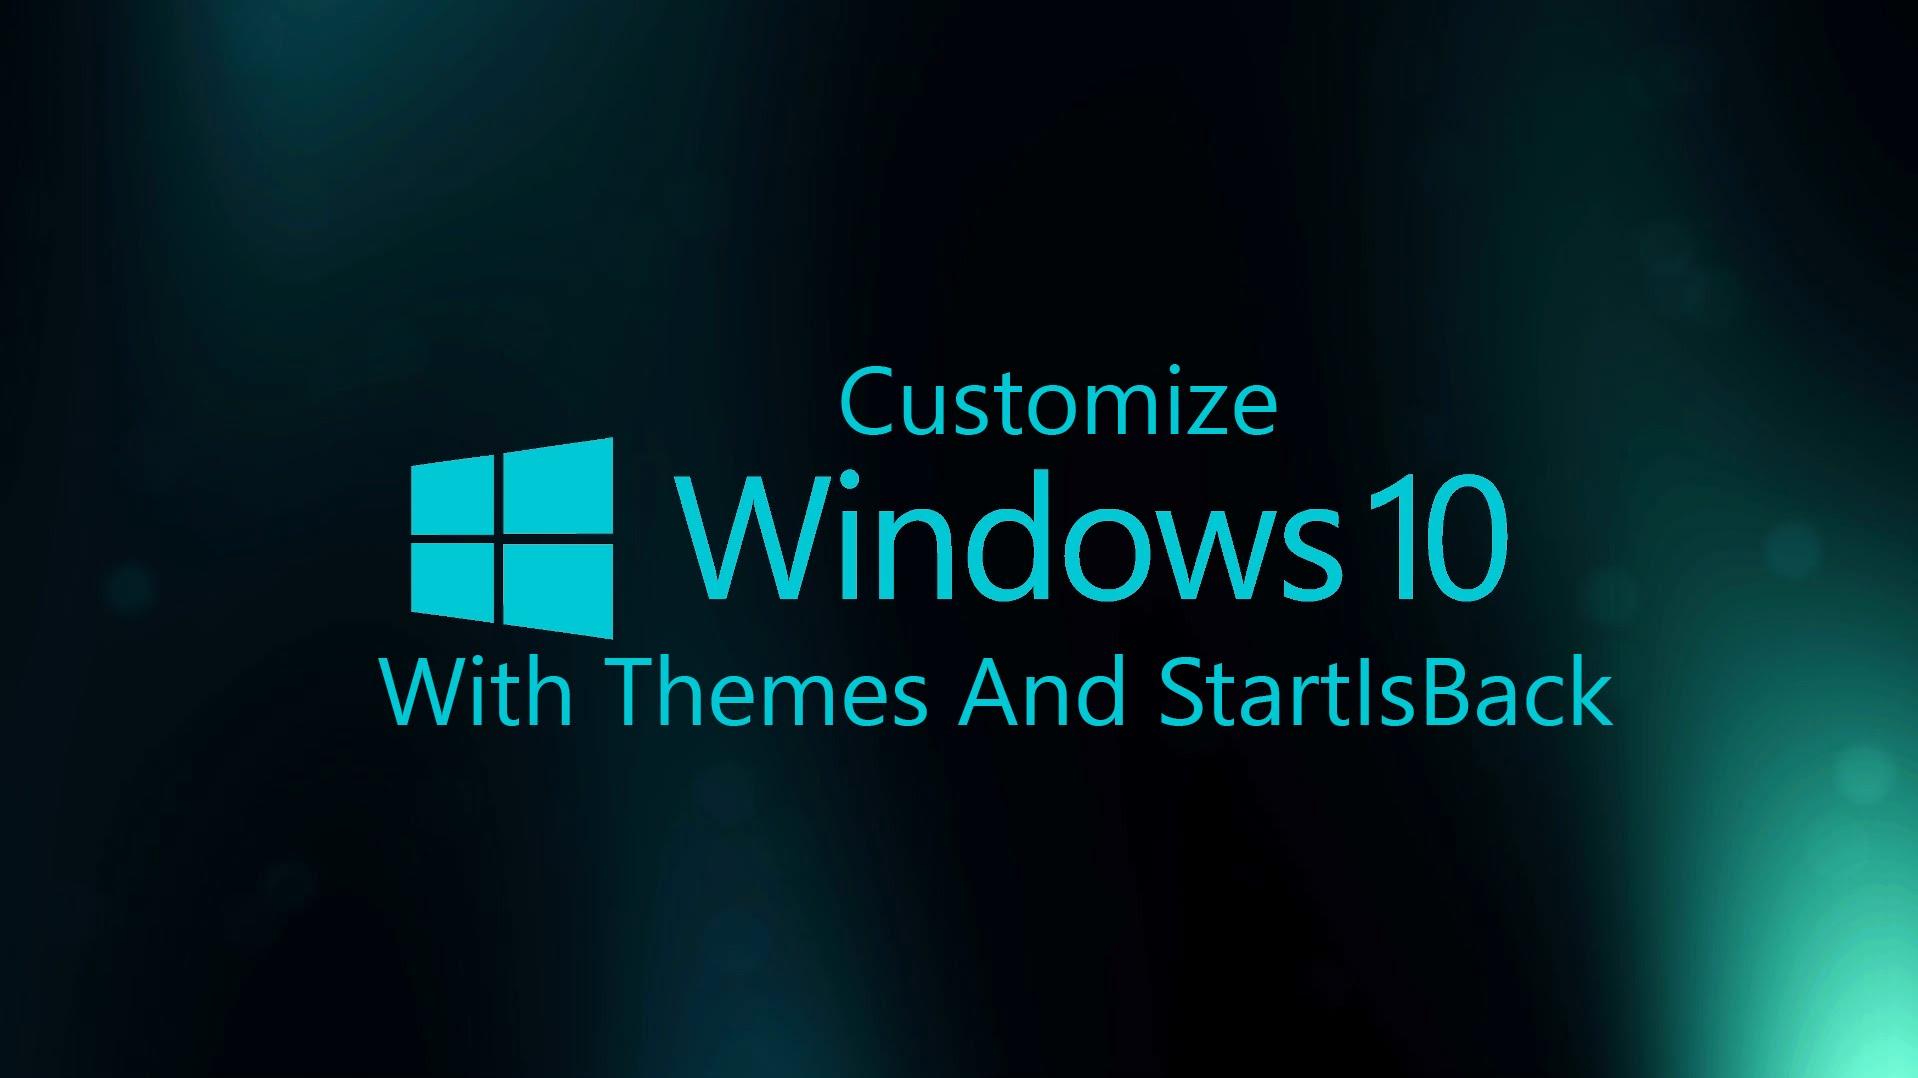 best windows 10 custom themes for enhanced experience 2018